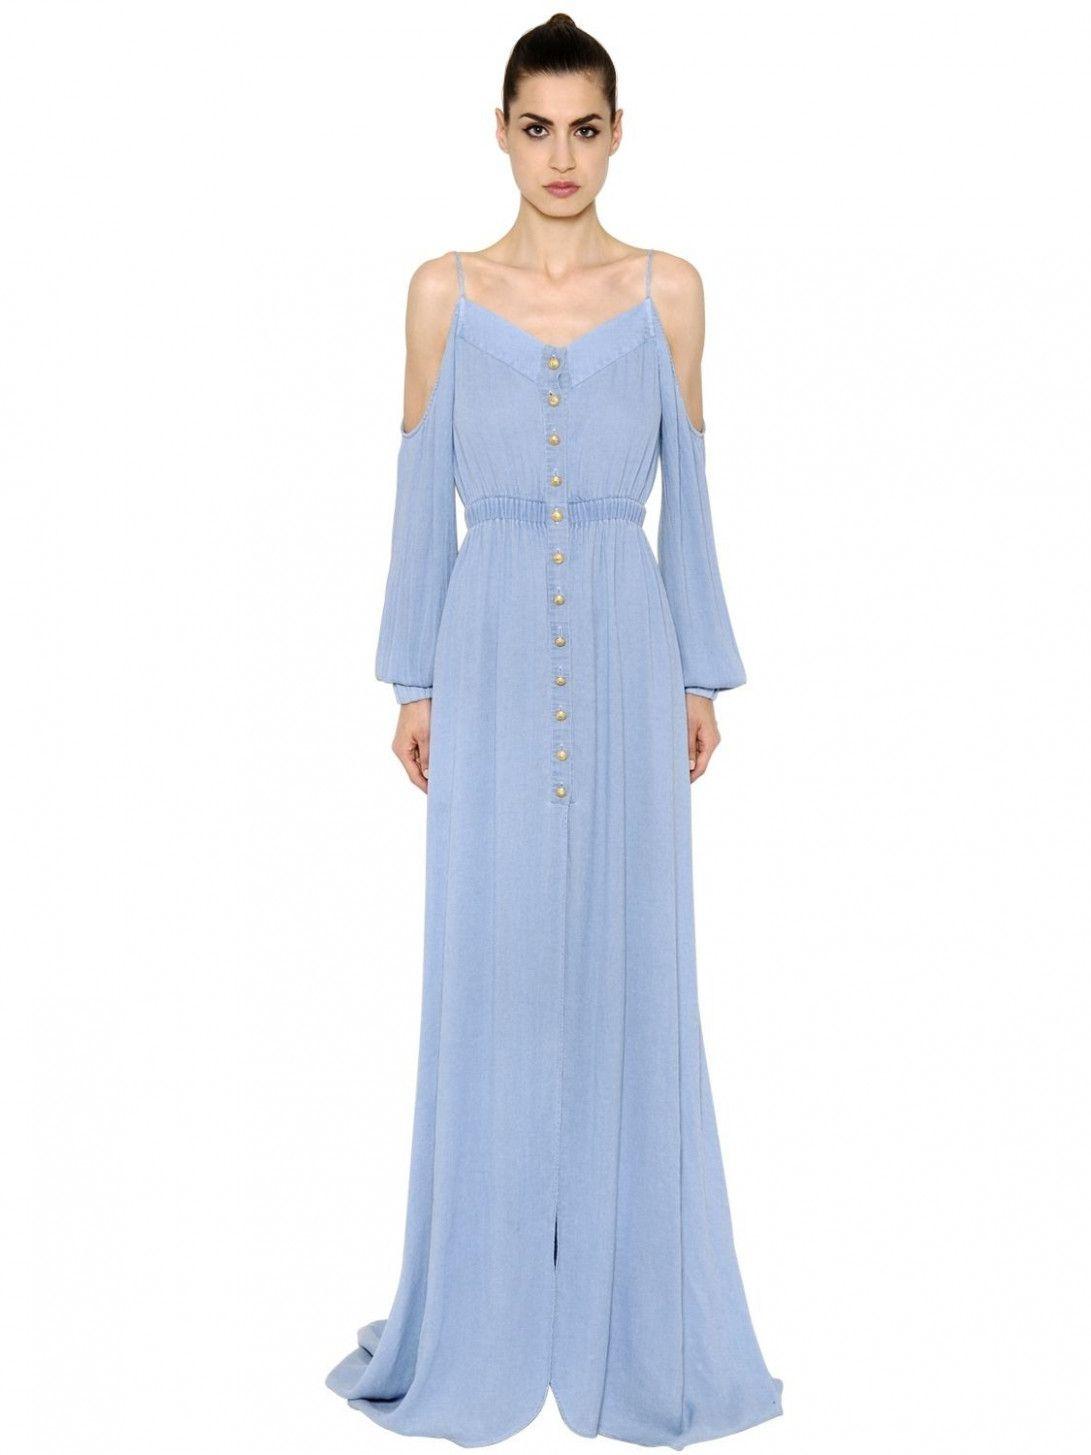 12 langes kleid hellblau | lange kleider, kleider